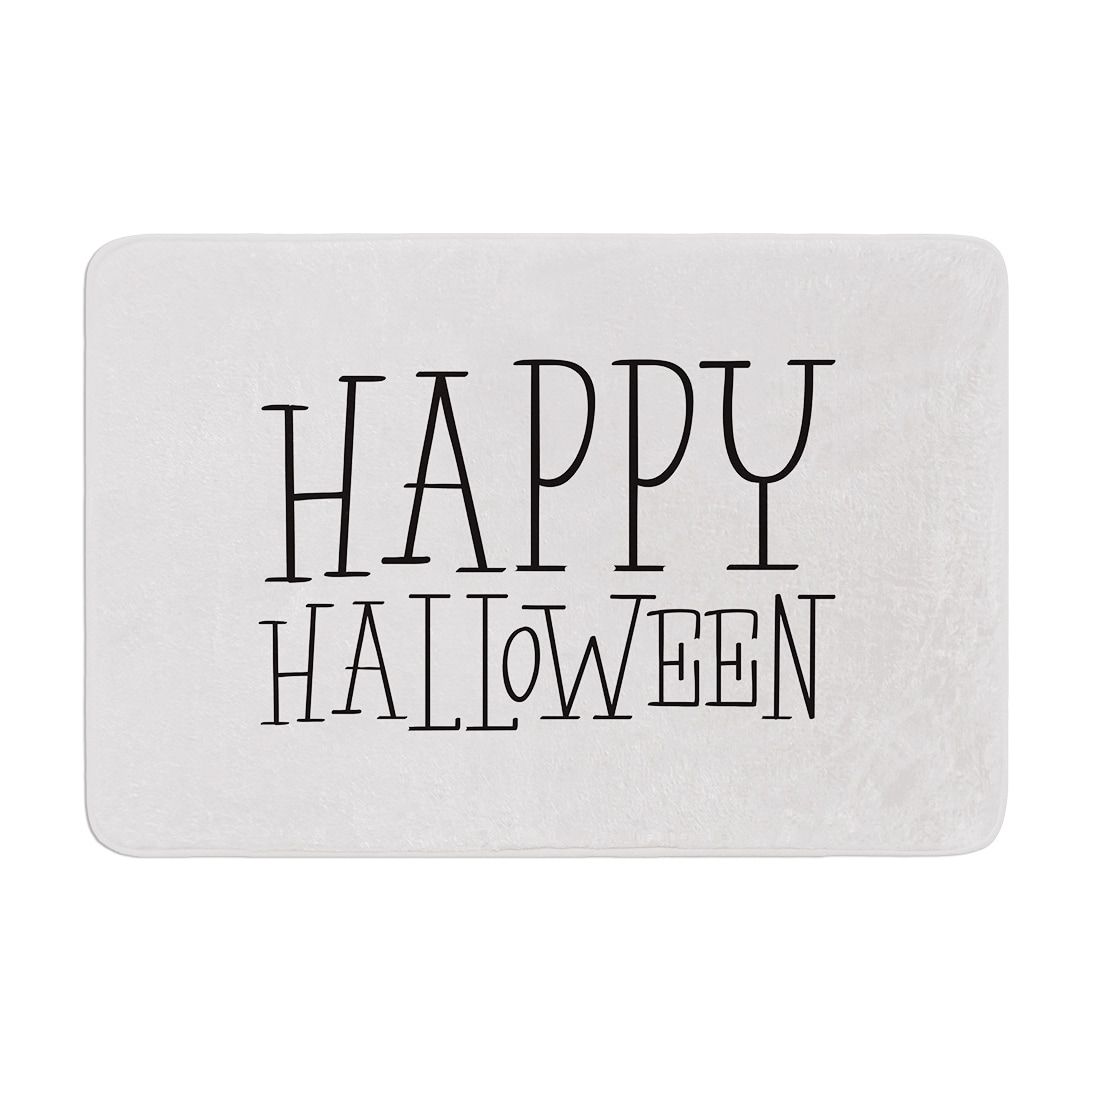 Kess Original Happy Halloween White Memory Foam Bath Mat On Sale Overstock 28448554